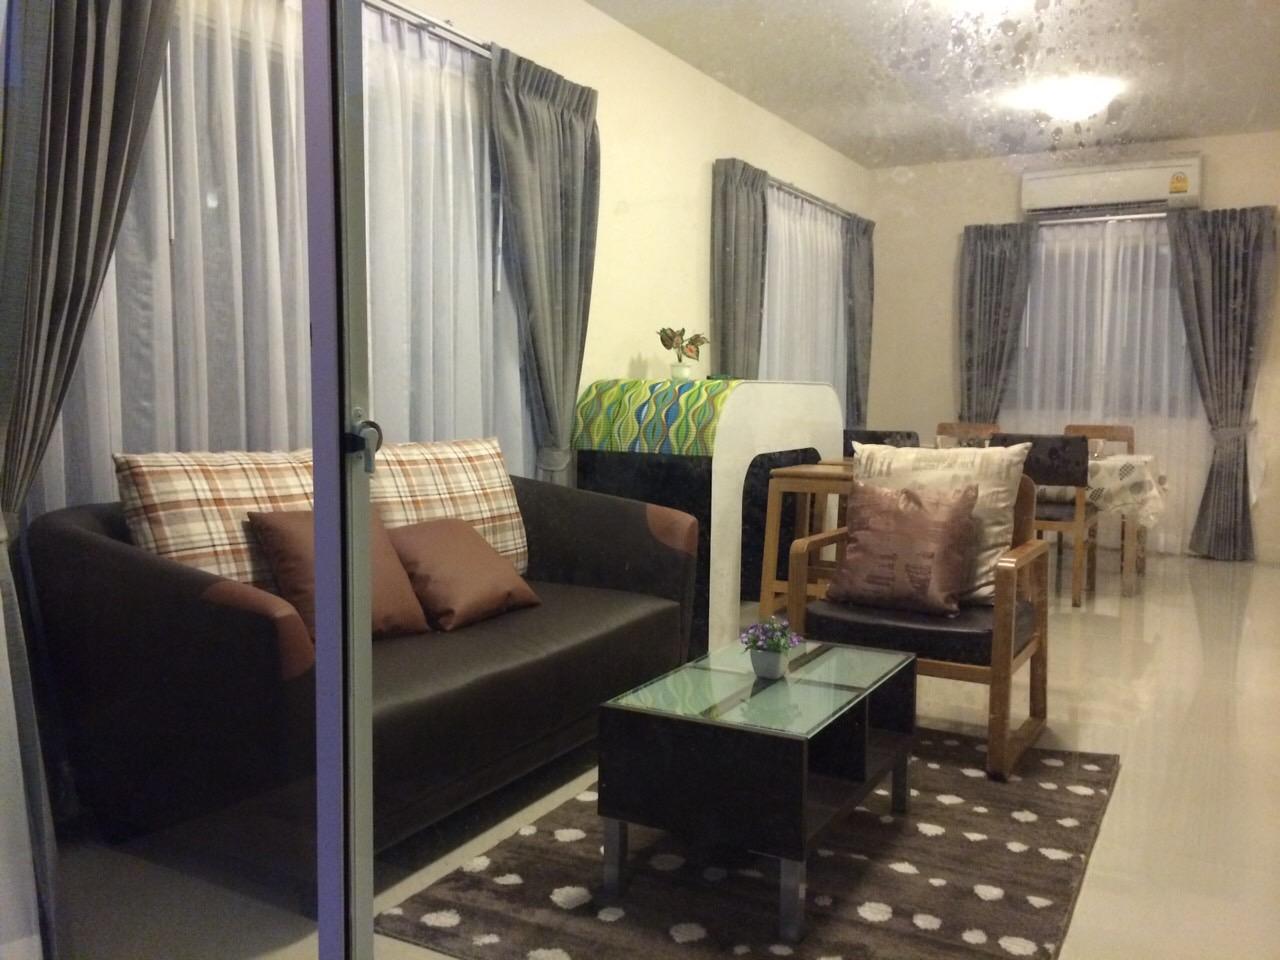 3 bedroom house for rent in Kok Keaw